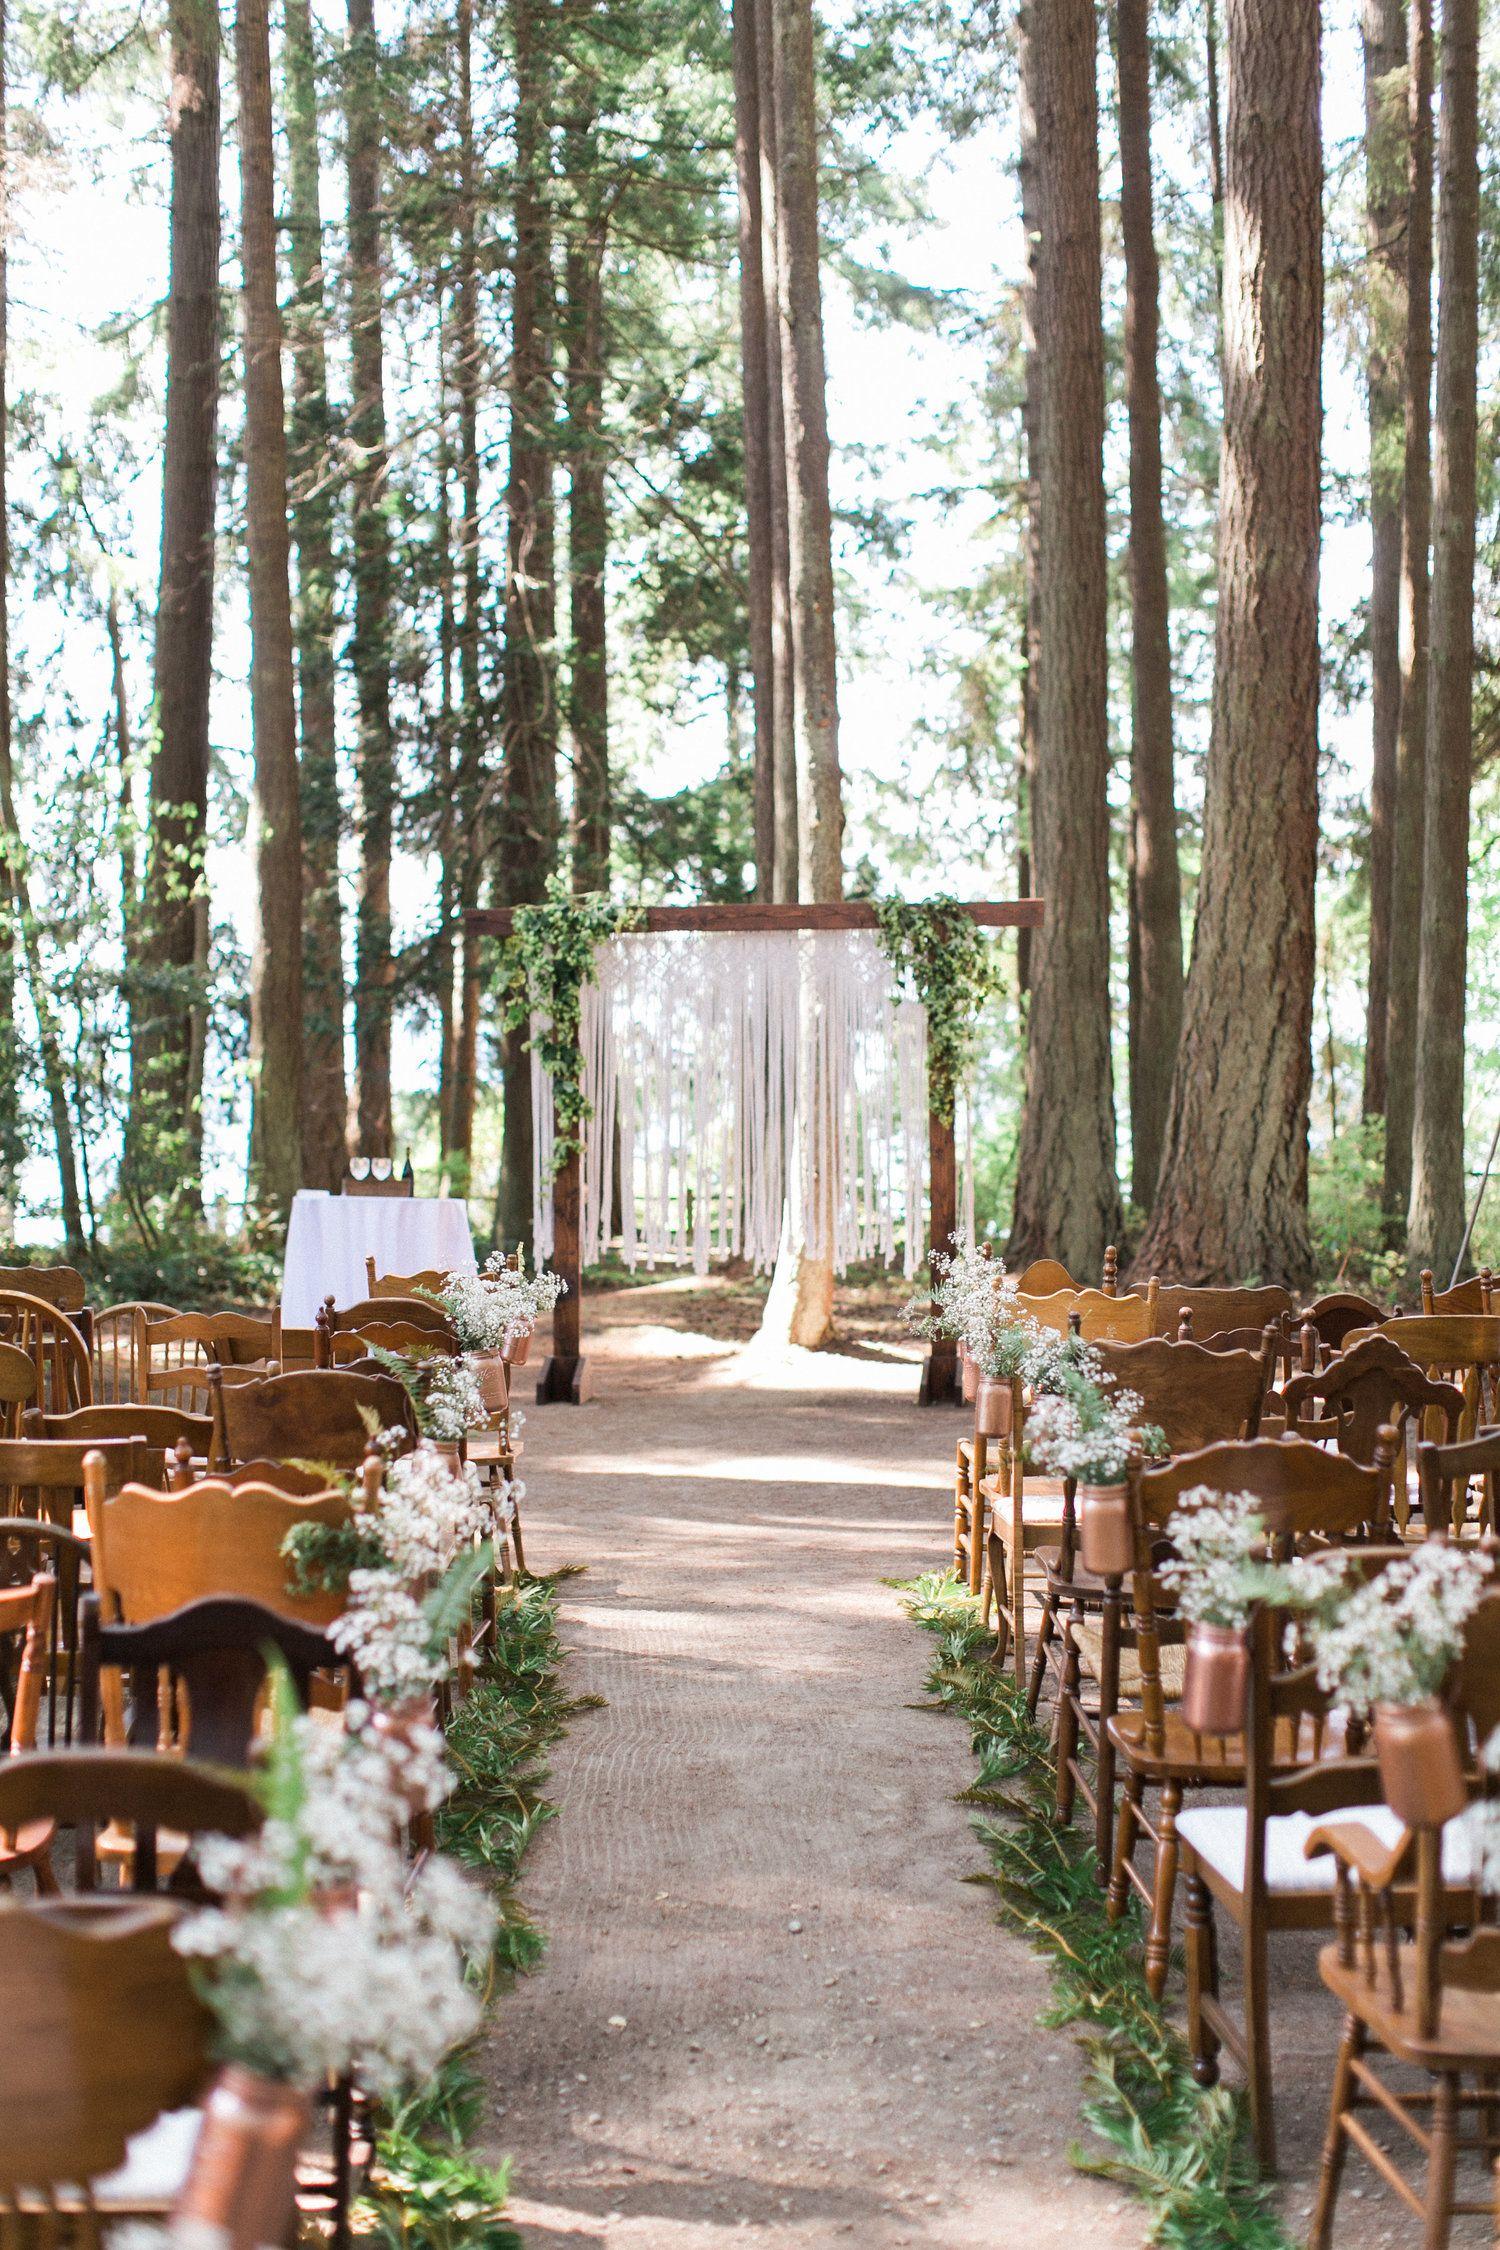 Journal Kaysen Photography In 2020 Forest Theme Wedding Forest Wedding Twilight Wedding